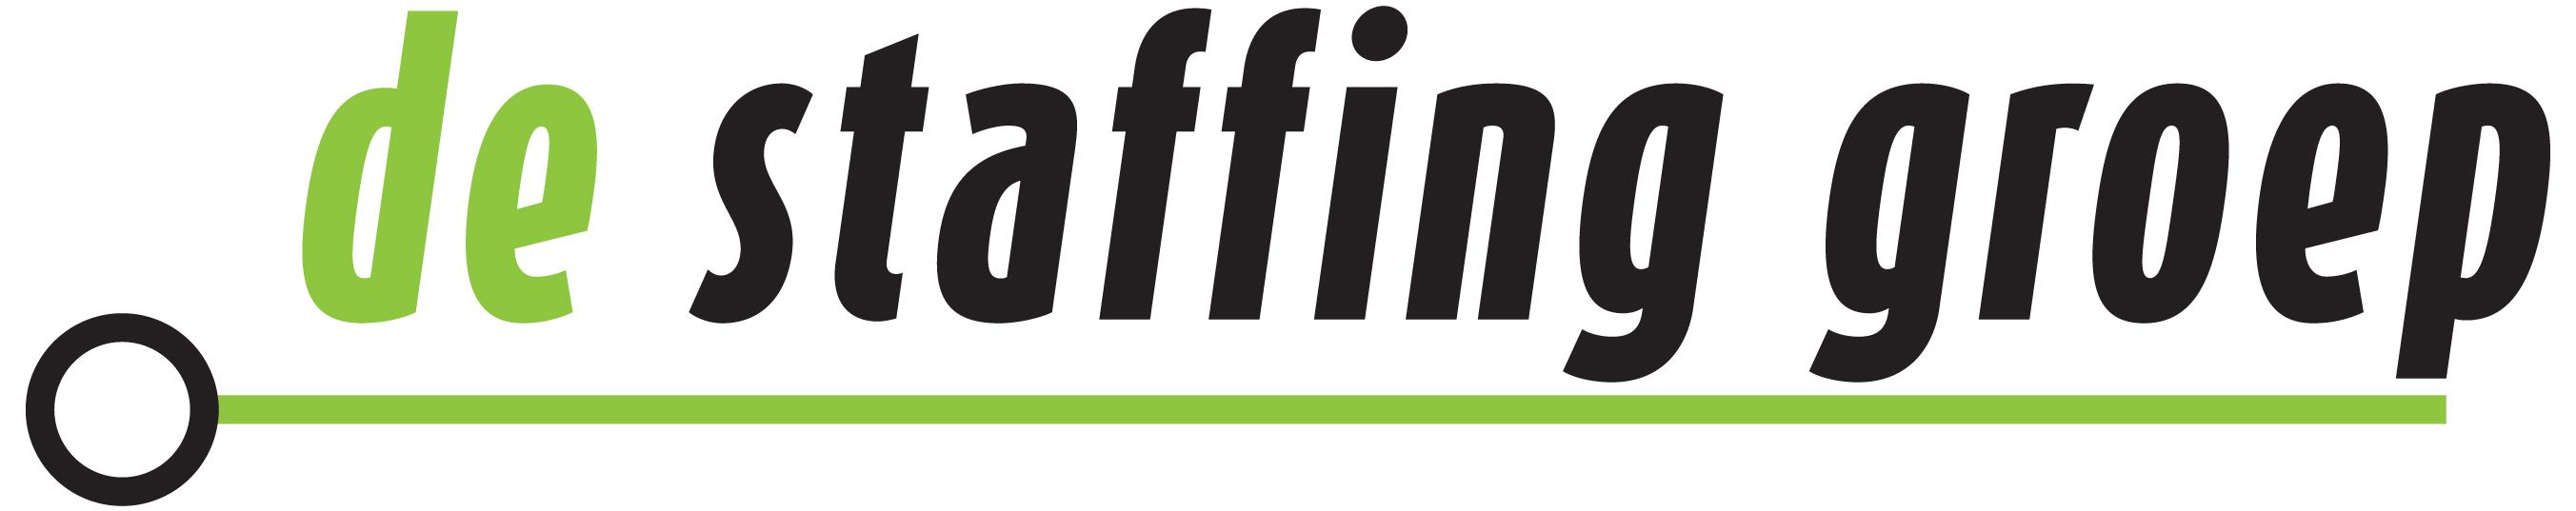 Logo De Staffing Groep-POS